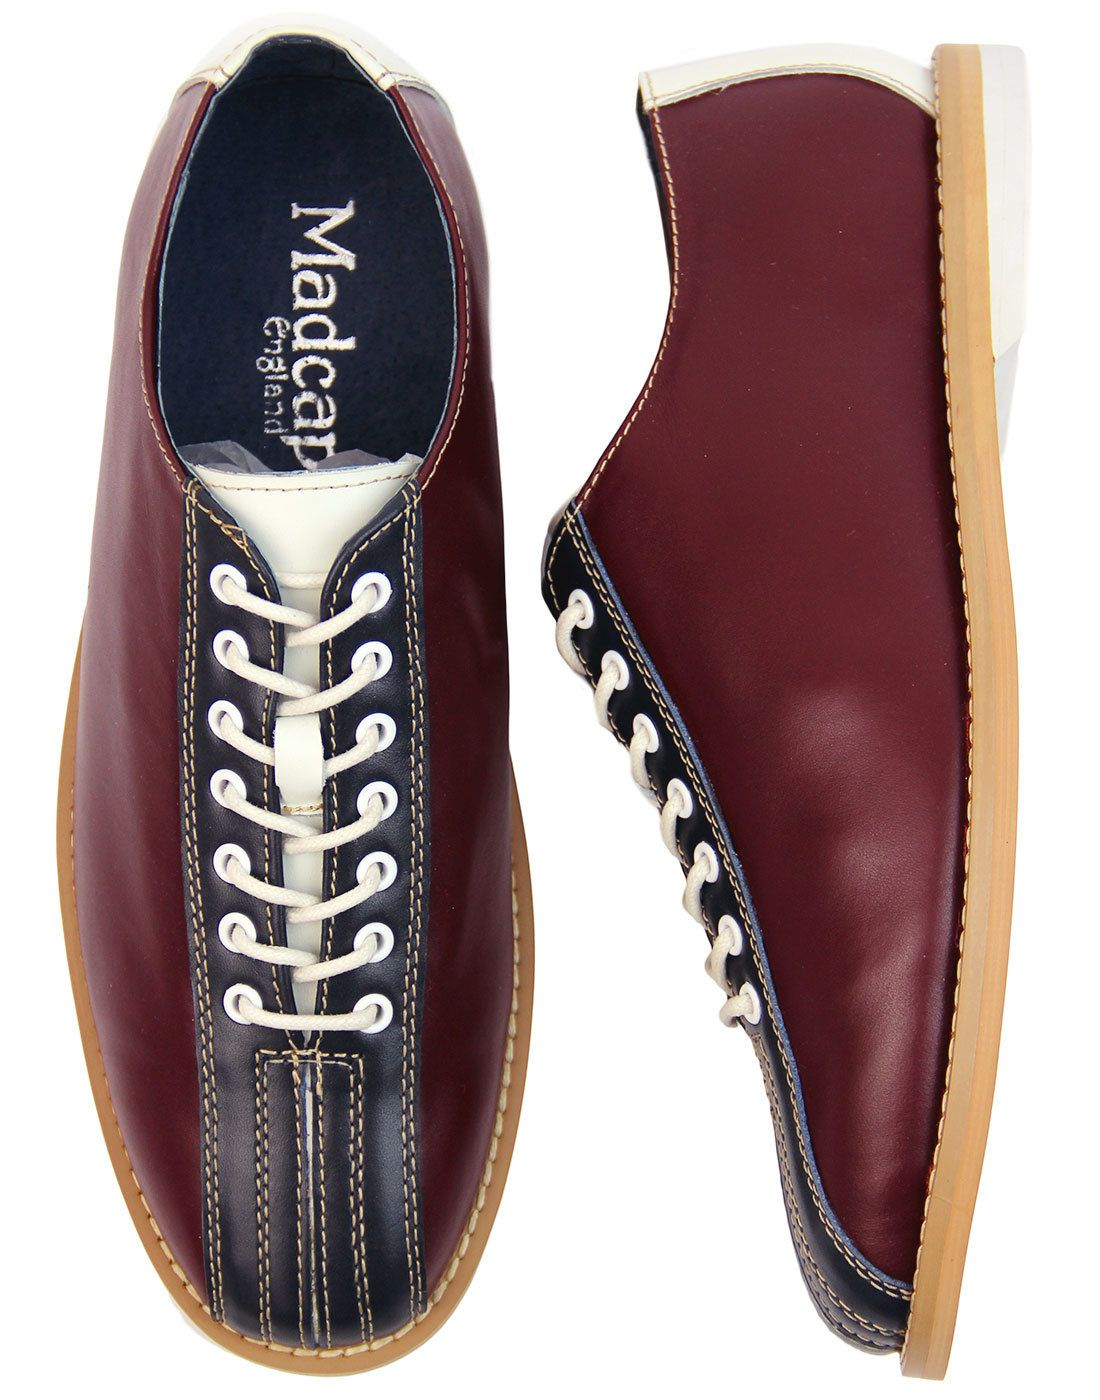 wholesale dealer 1e21f b90a6 The Dudette MADCAP ENGLAND Retro Mod Bowling Shoes